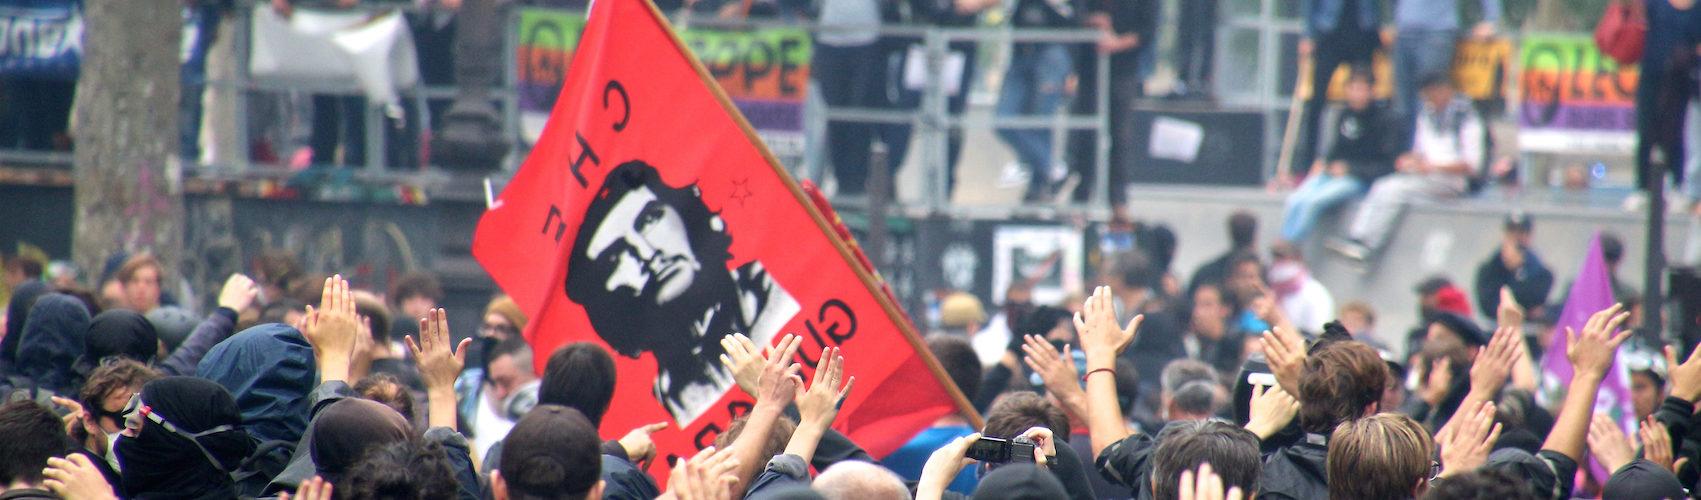 Manifestation et affrontements contre la loi El Khomri